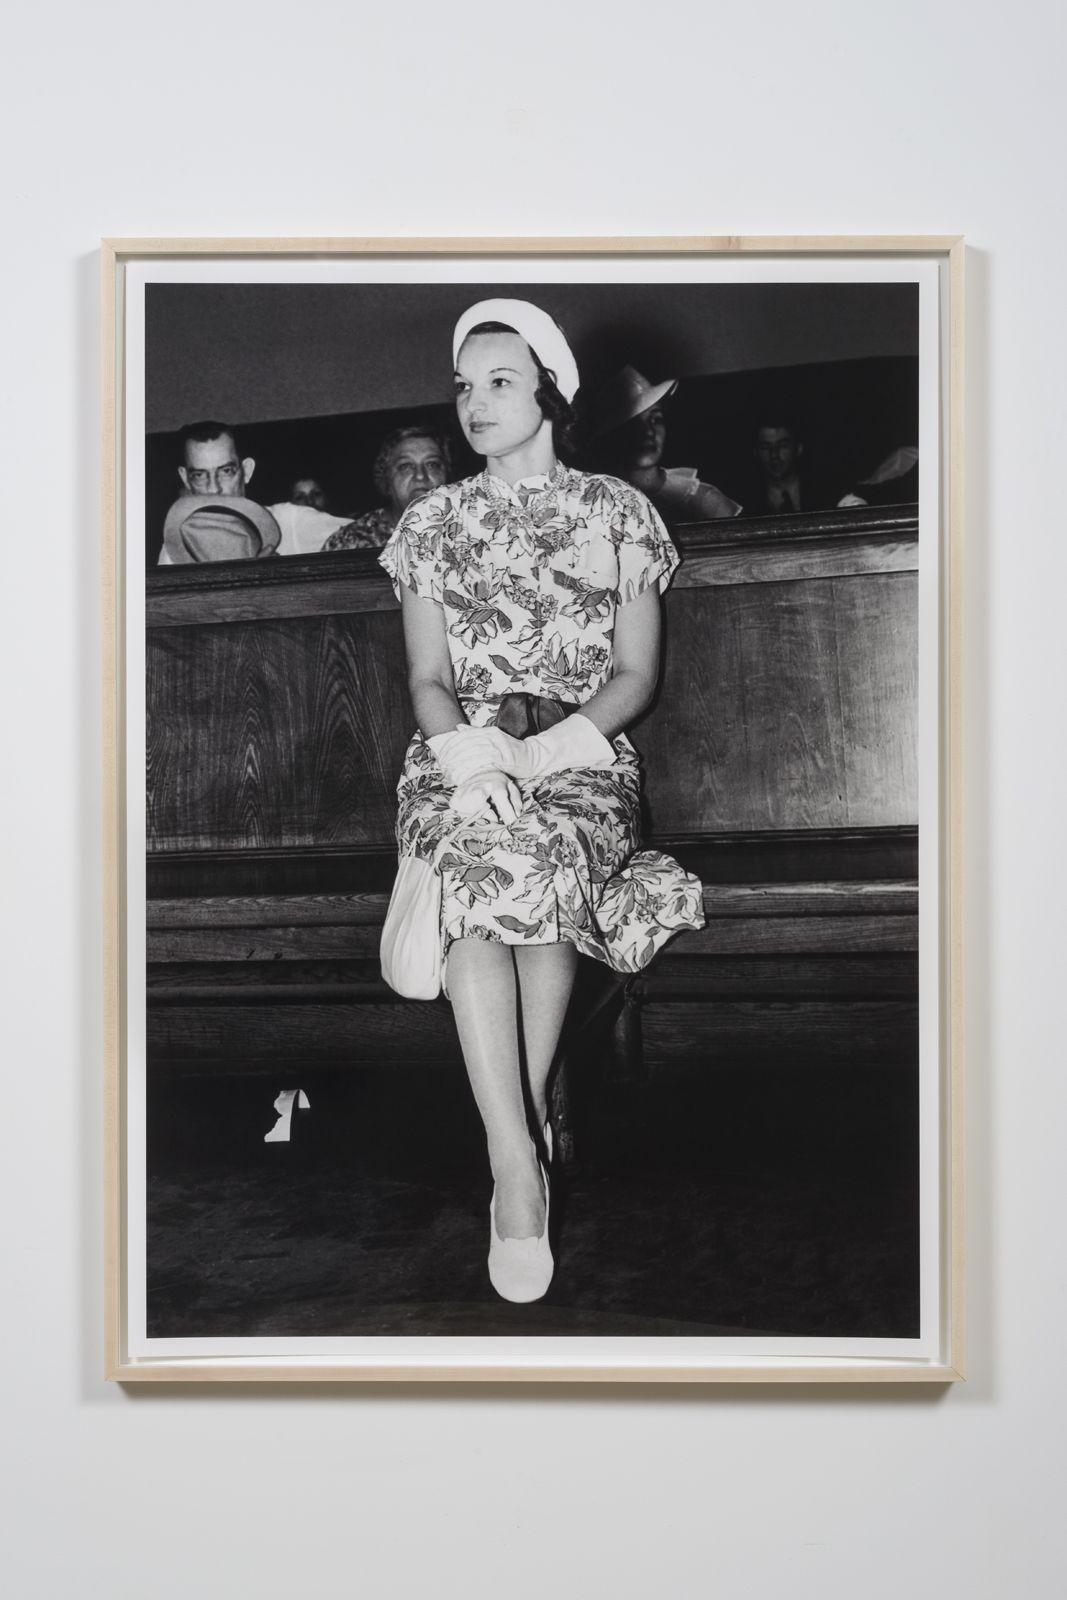 Number 19: Lillian, 2015, Archival pigment print